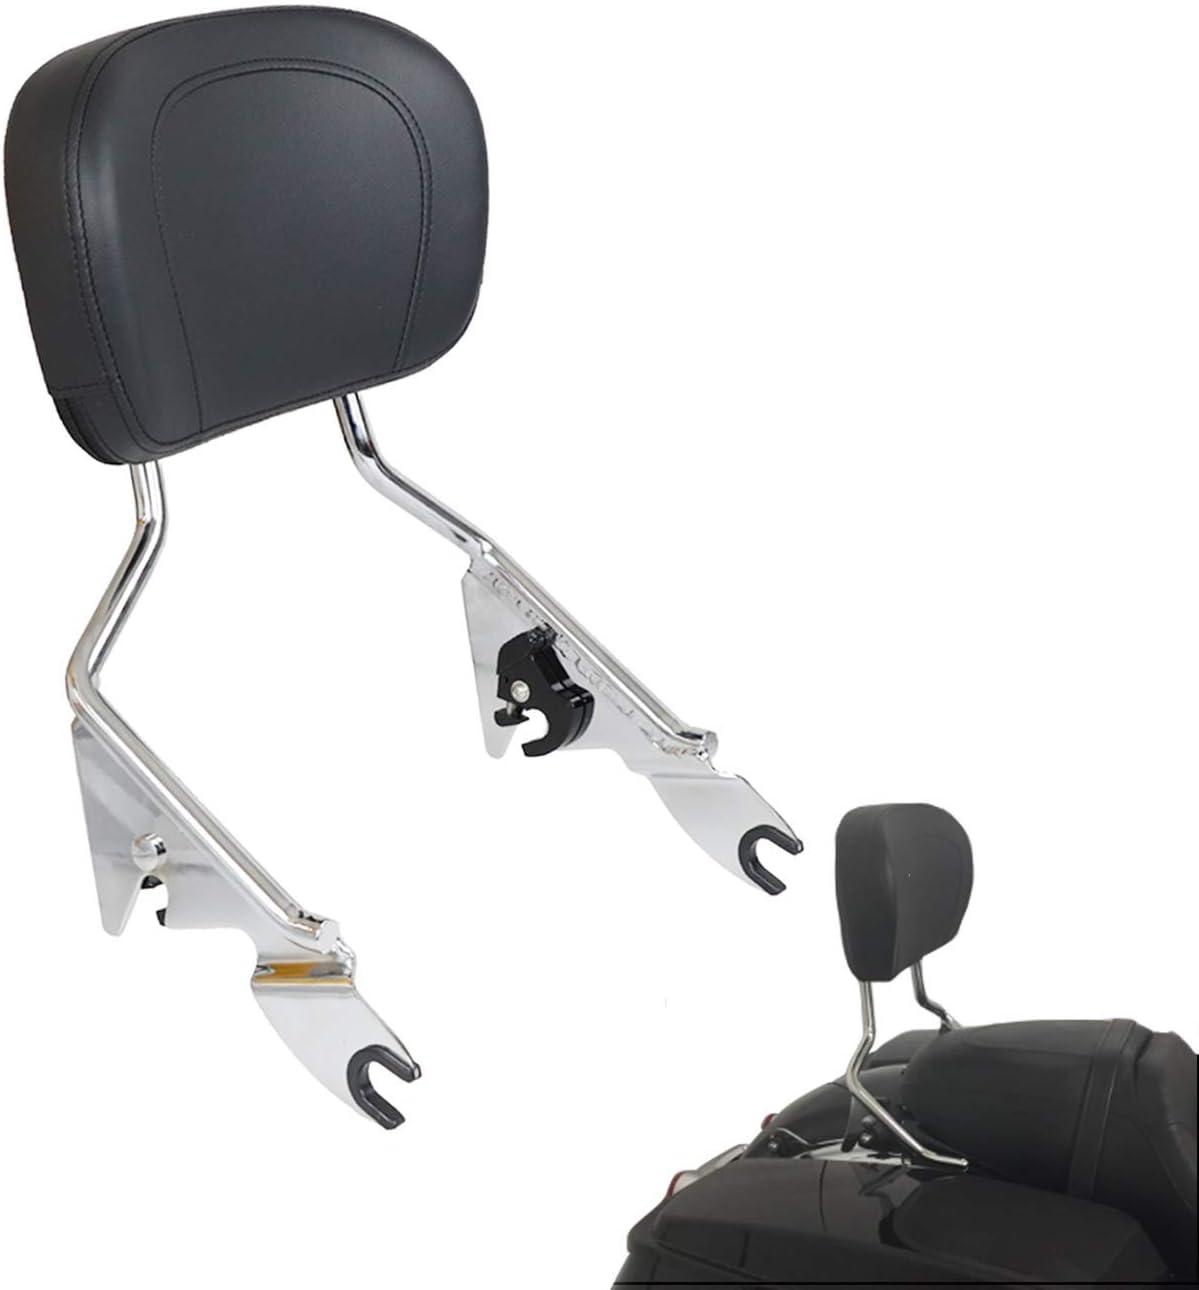 AUFER Detachable Backrest Sissy Bar Upright Passenger Backrest w//Pad For Touring Road King Street Glide Electra Glide Road Glide FLHR FLHX FLHT FLTR 1997-2008(Black)